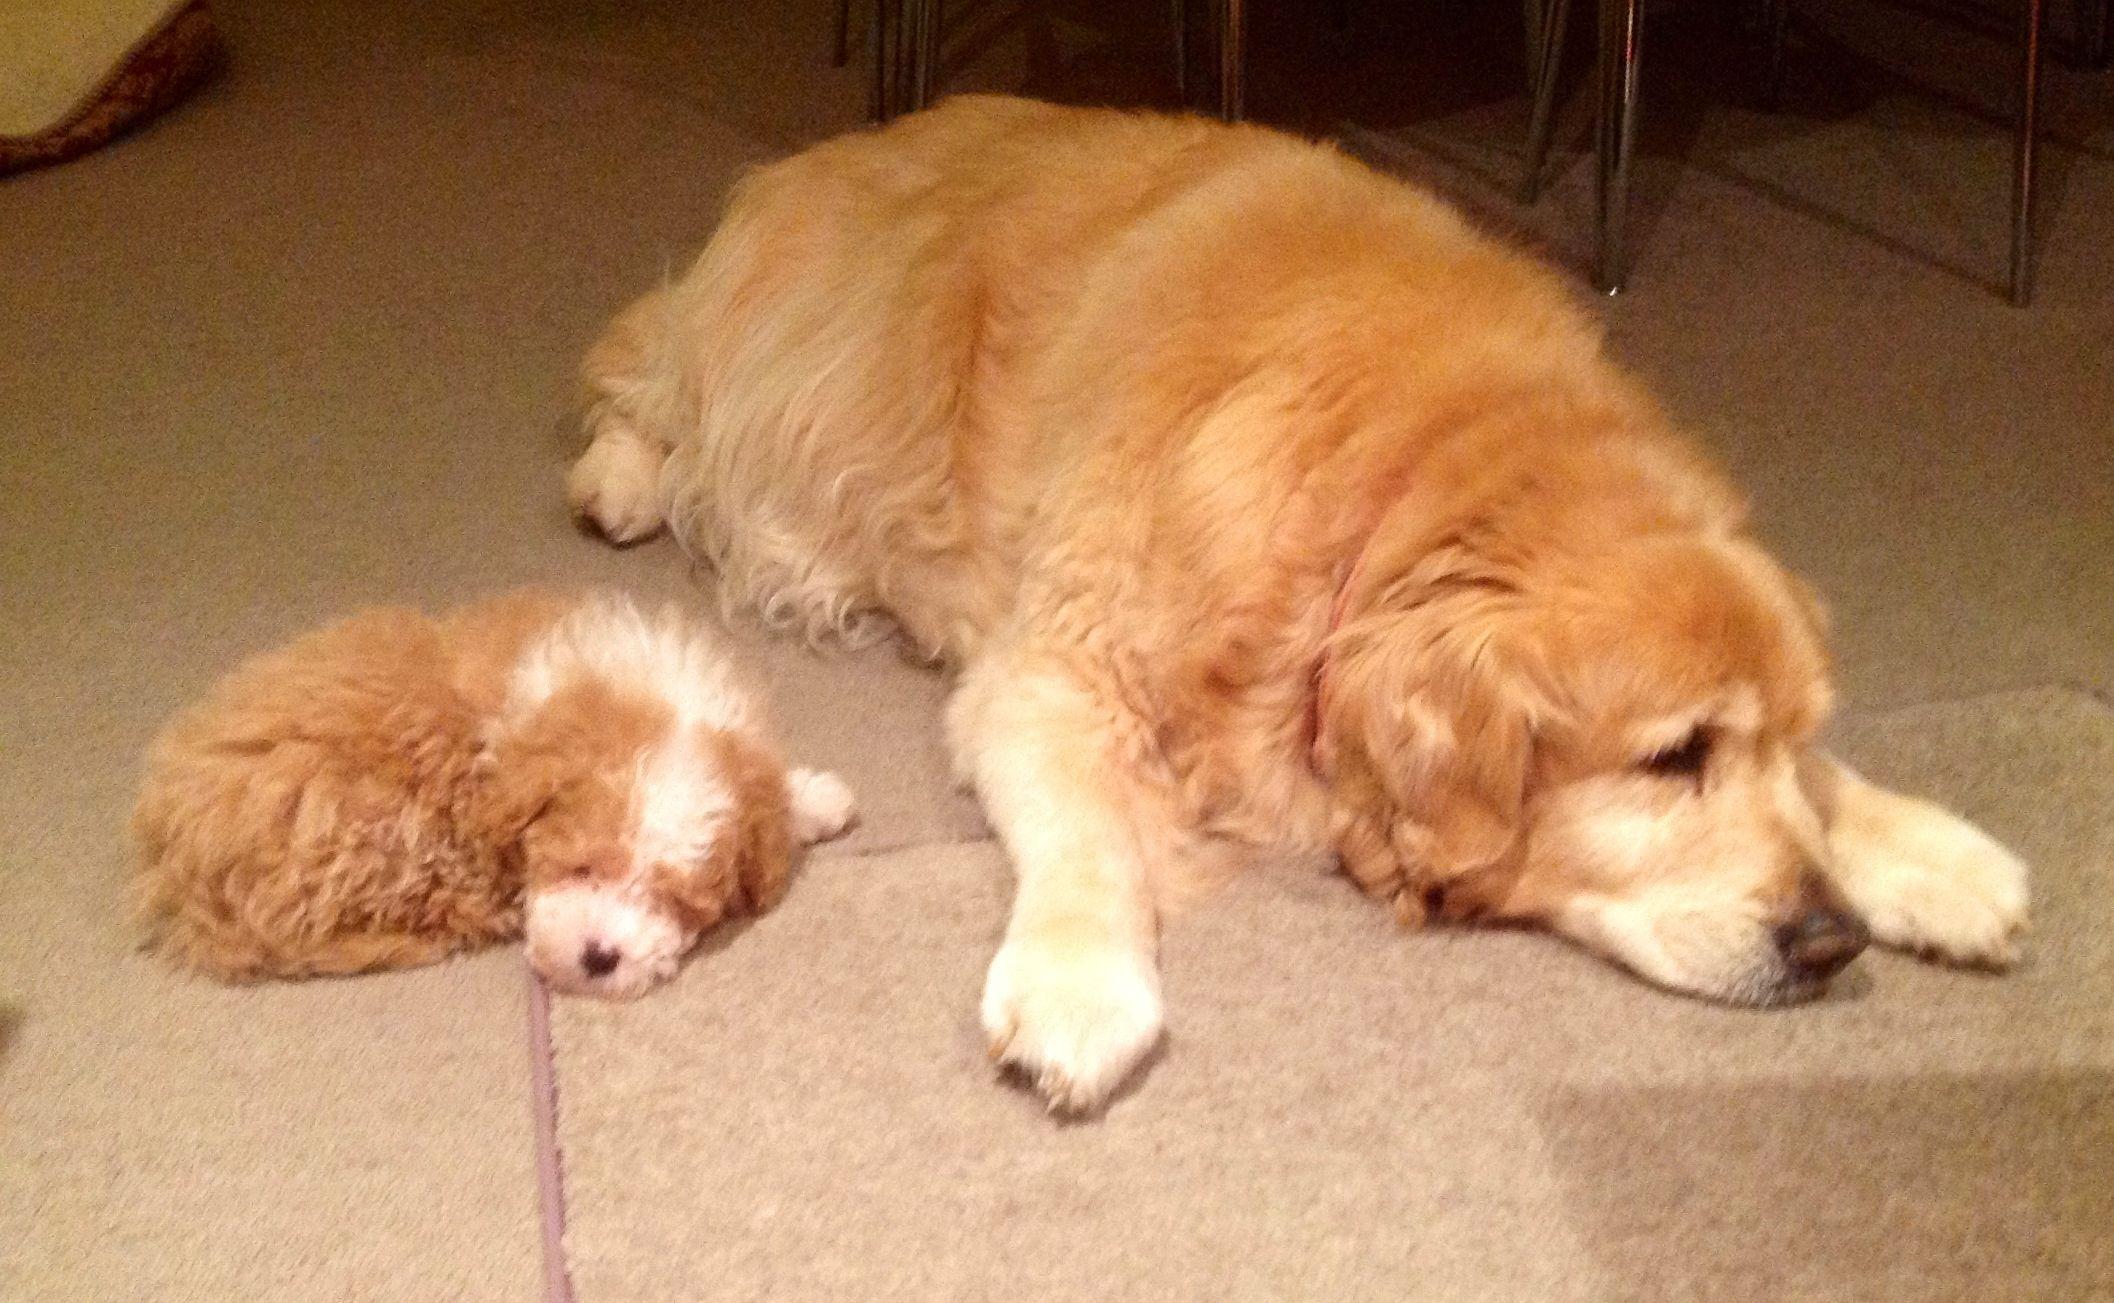 Sleeping Cavoodle And Golden Retriever Animals Golden Retriever Puppies